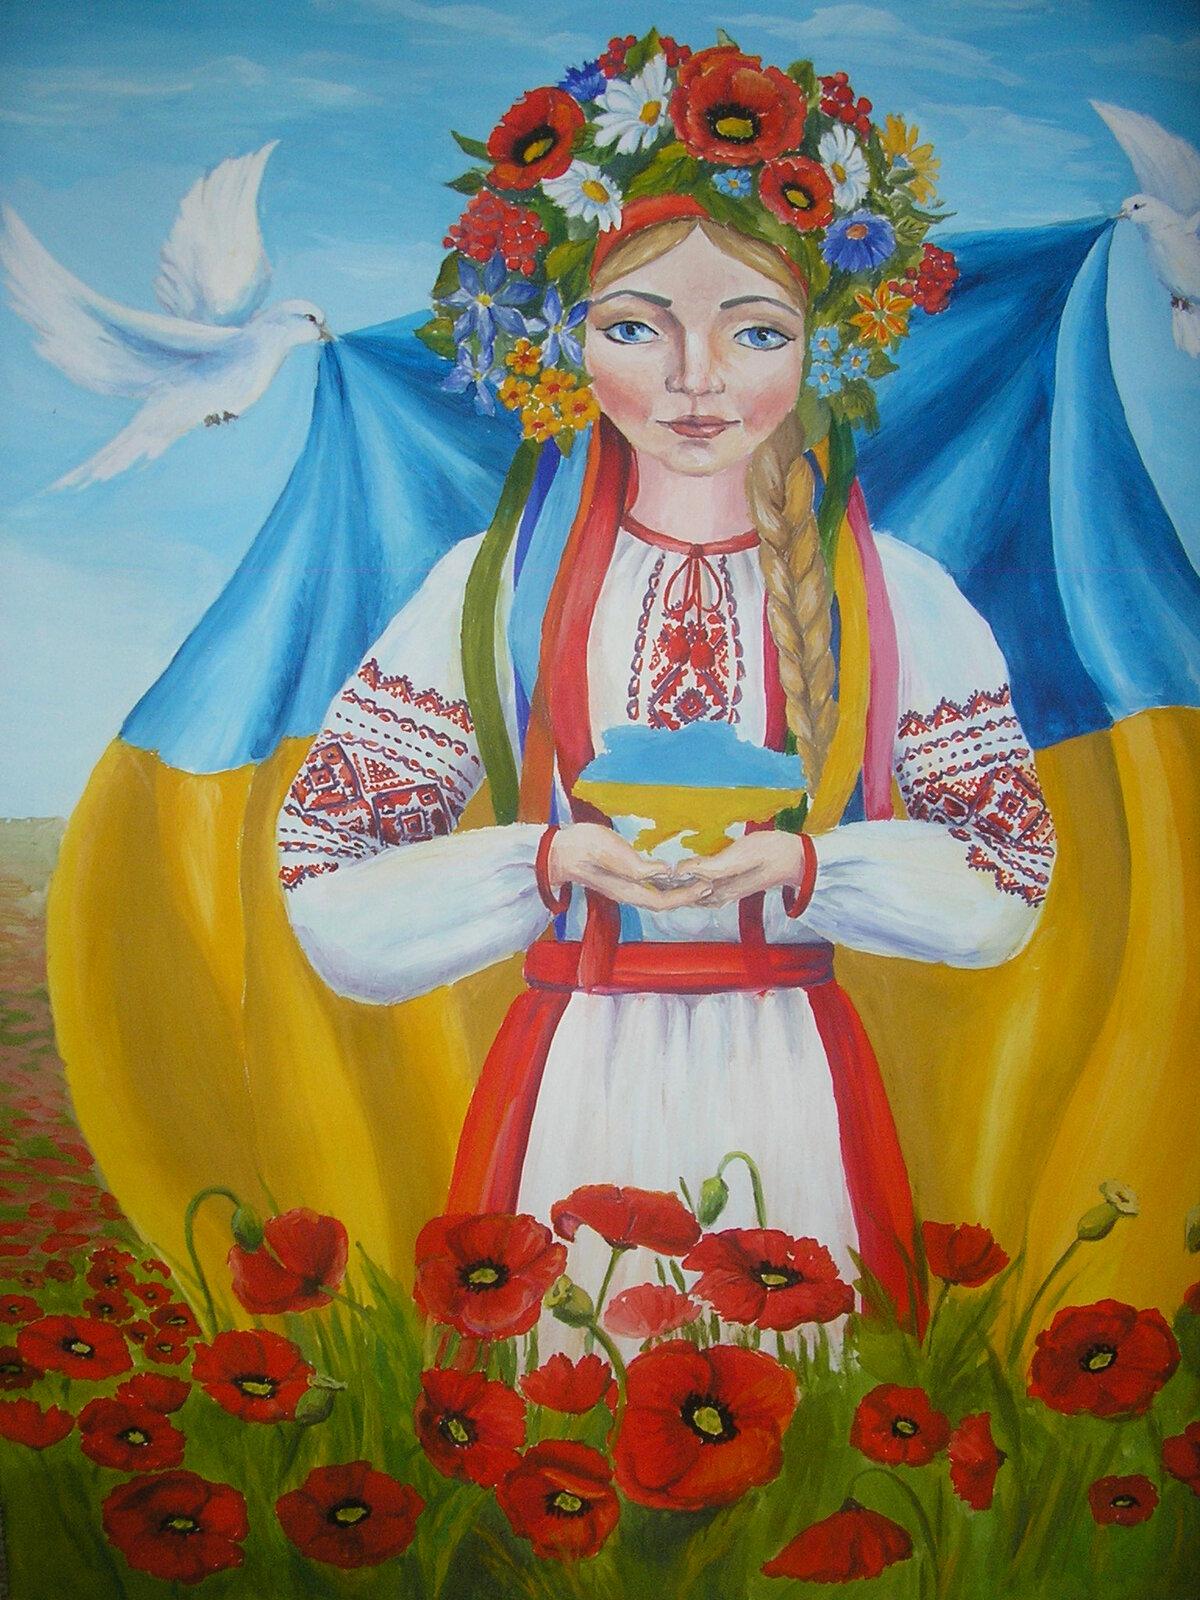 Картинки белорусской тематики